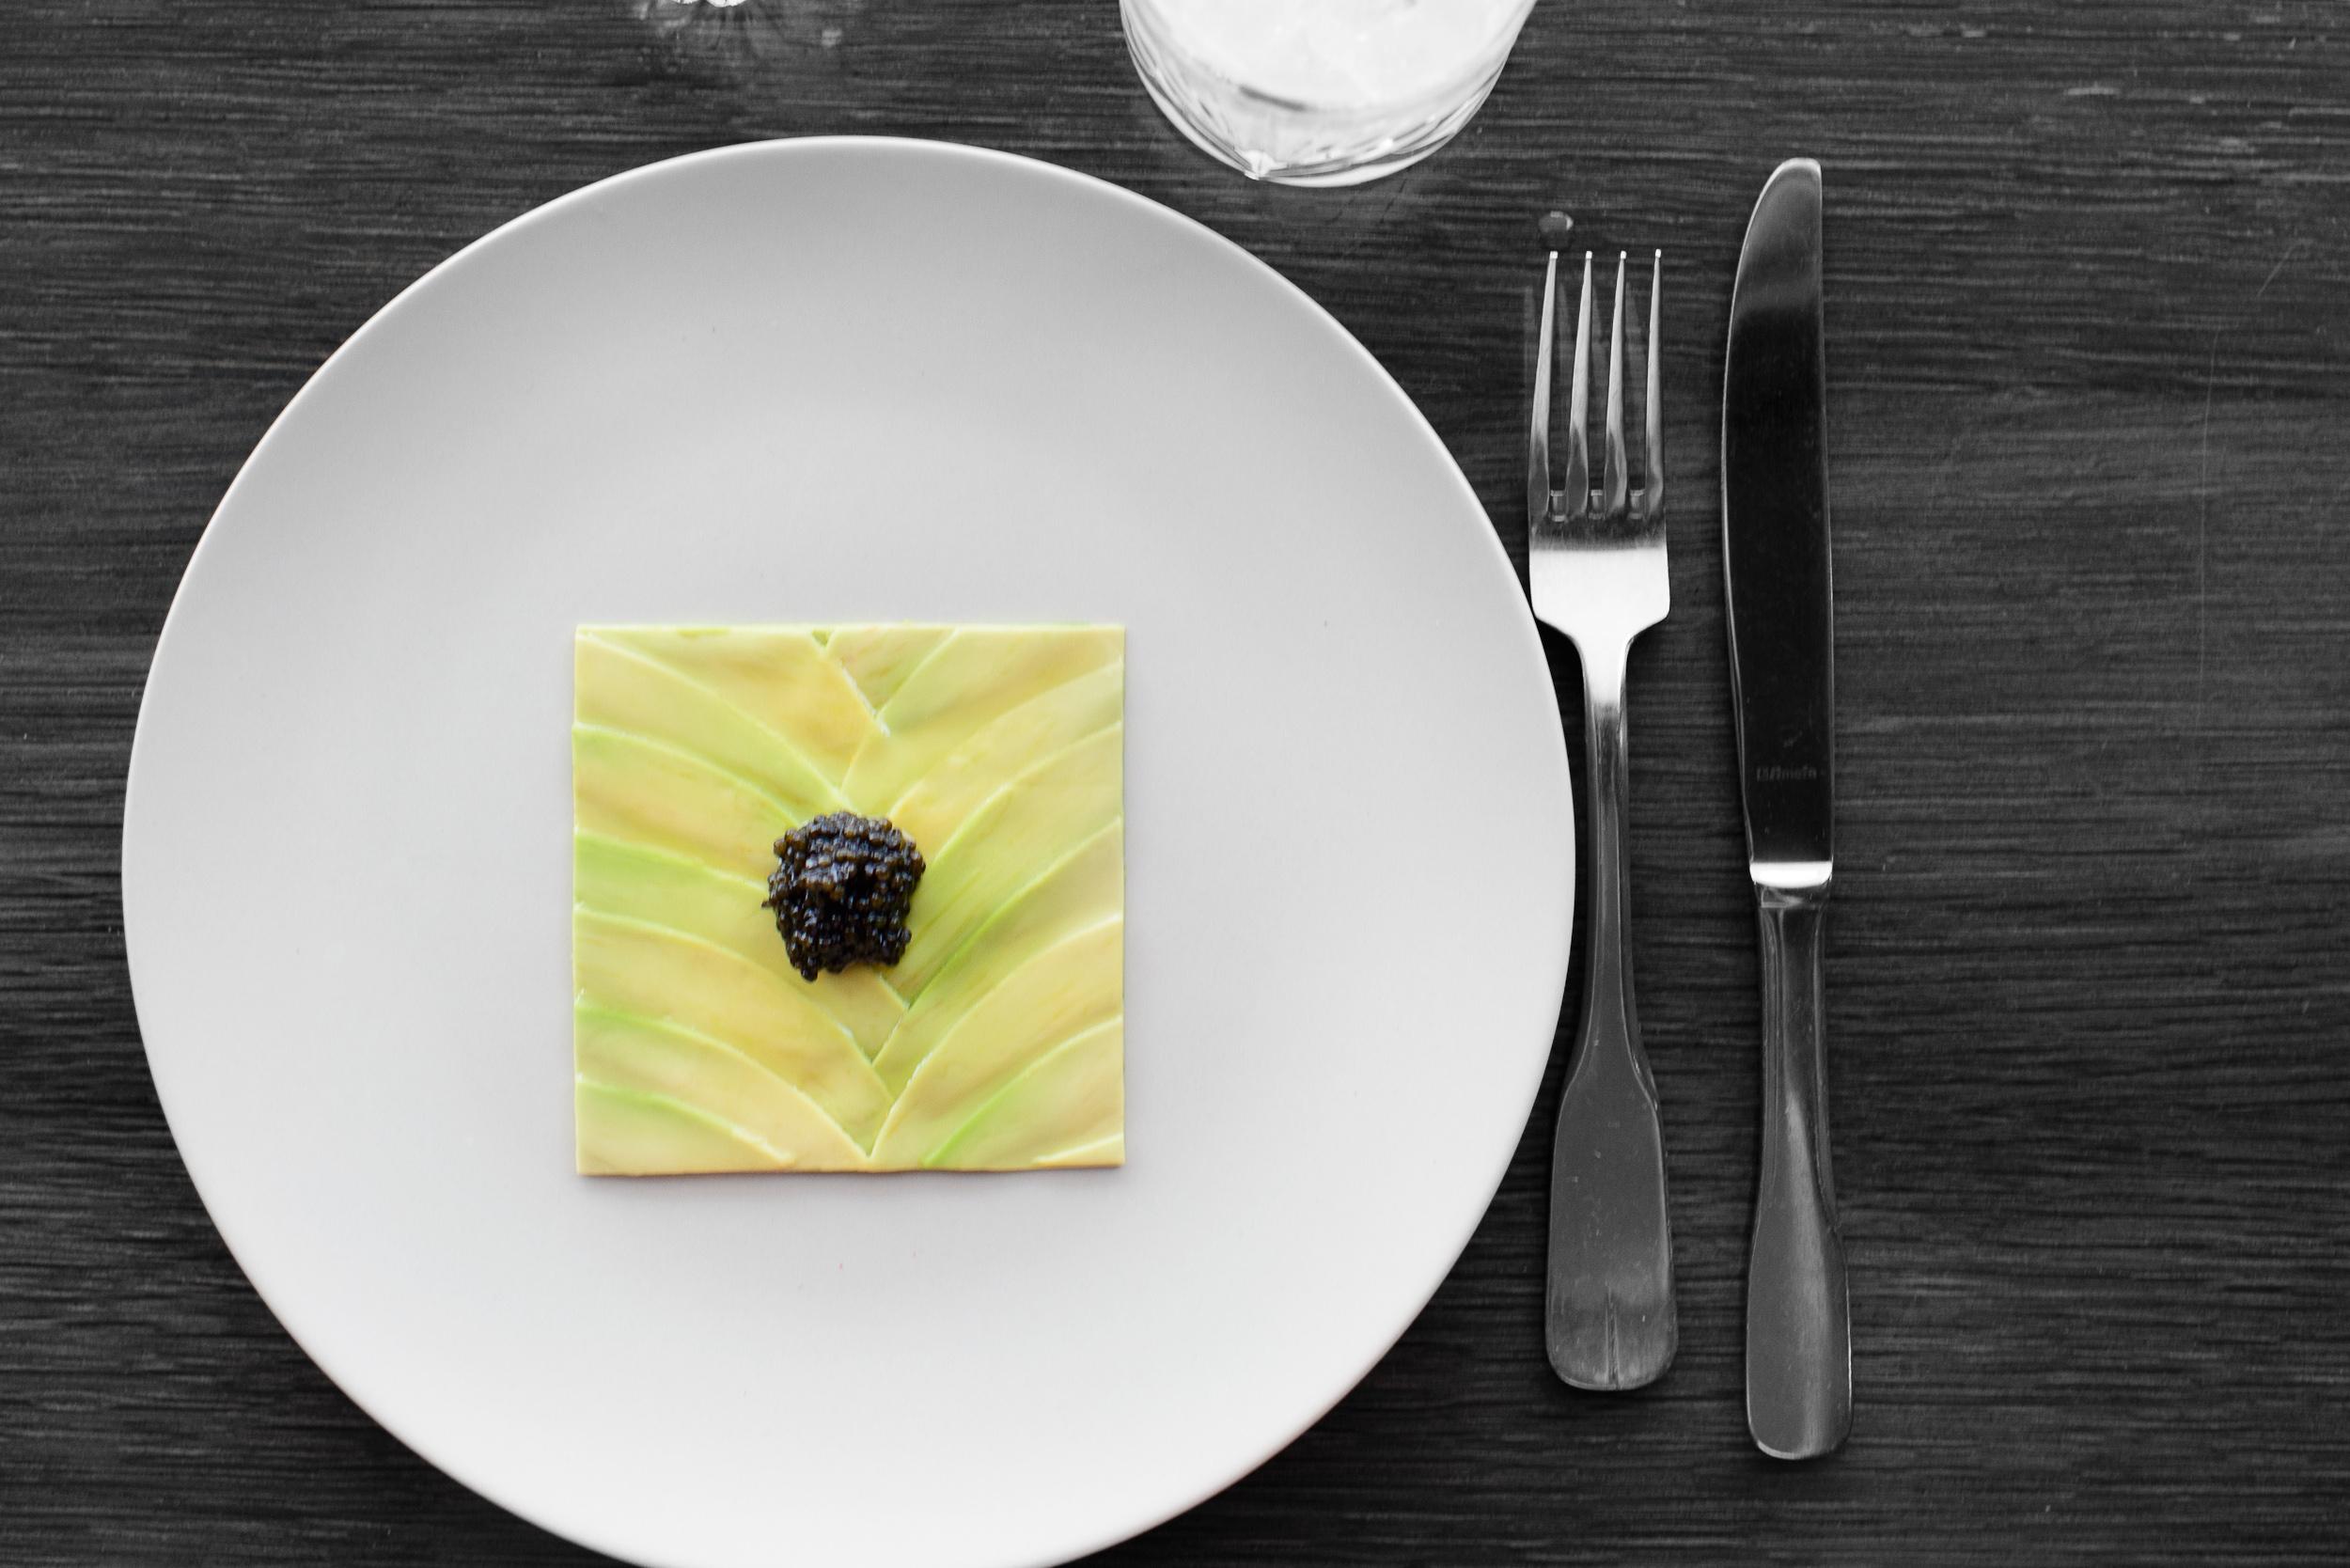 1st Course: Avocado, almond oil, caviar